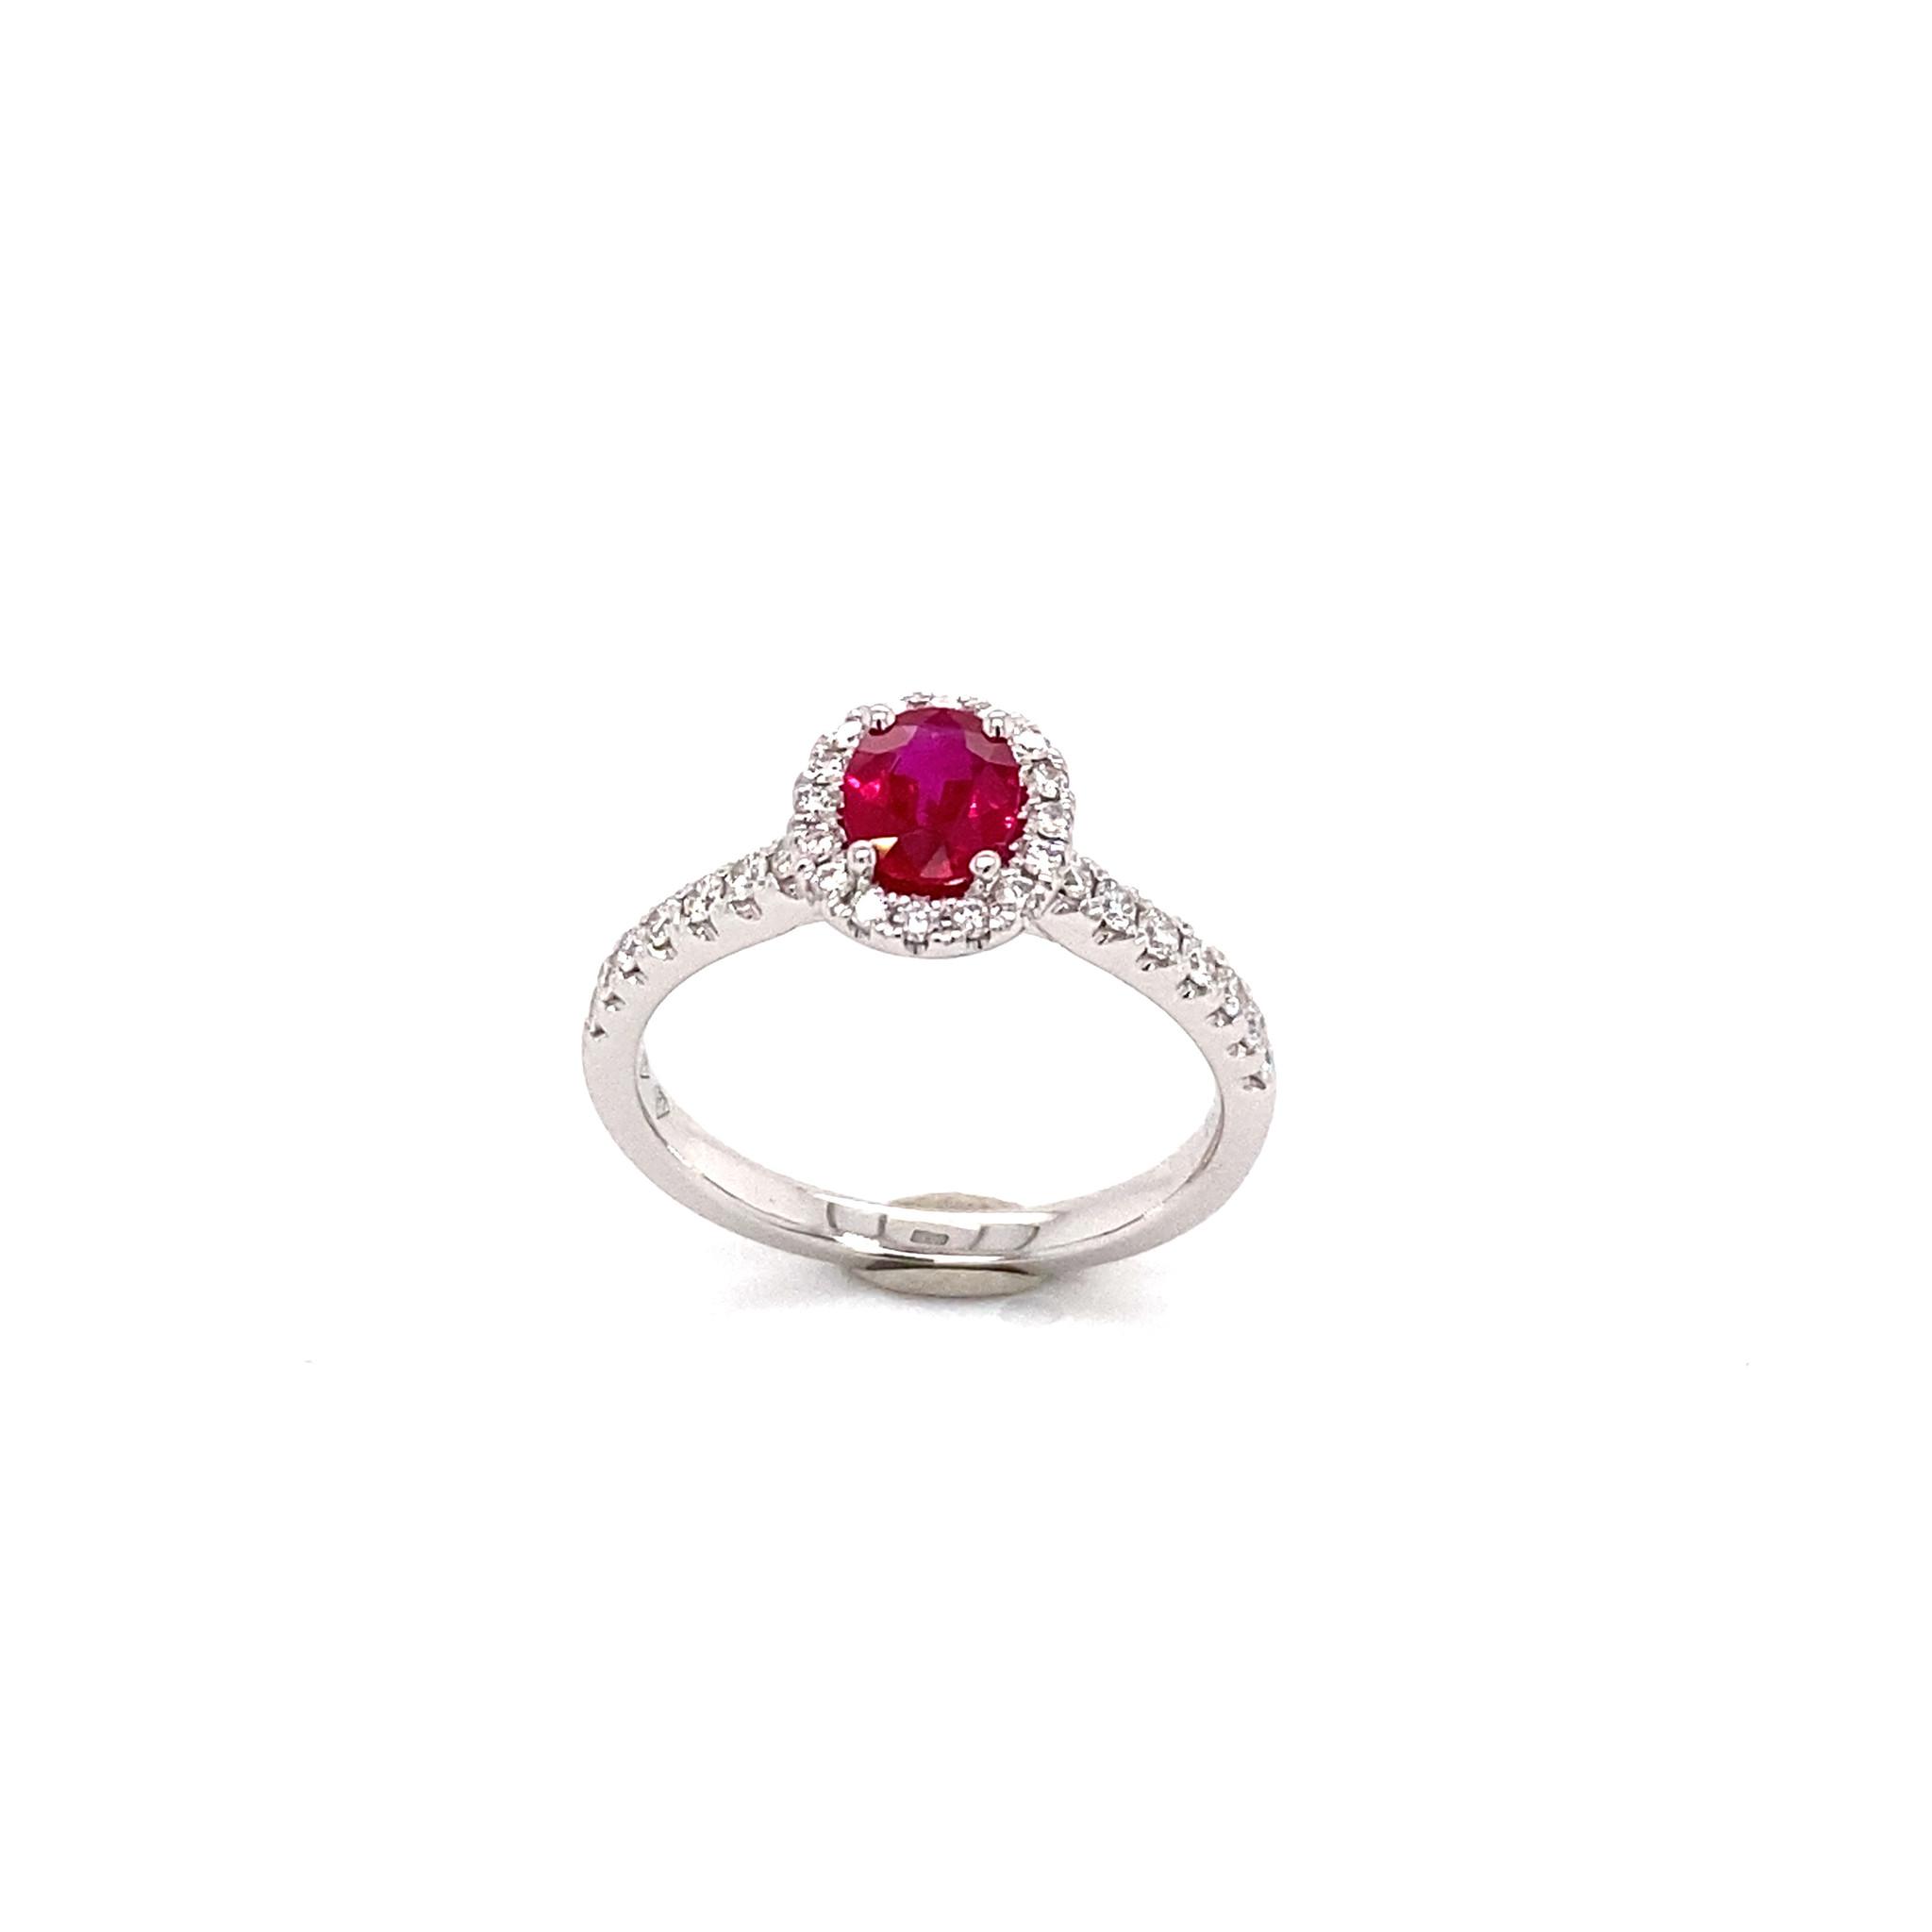 Private Label CvdK Private Label CvdK witgouden halo ring diamanten/robijn